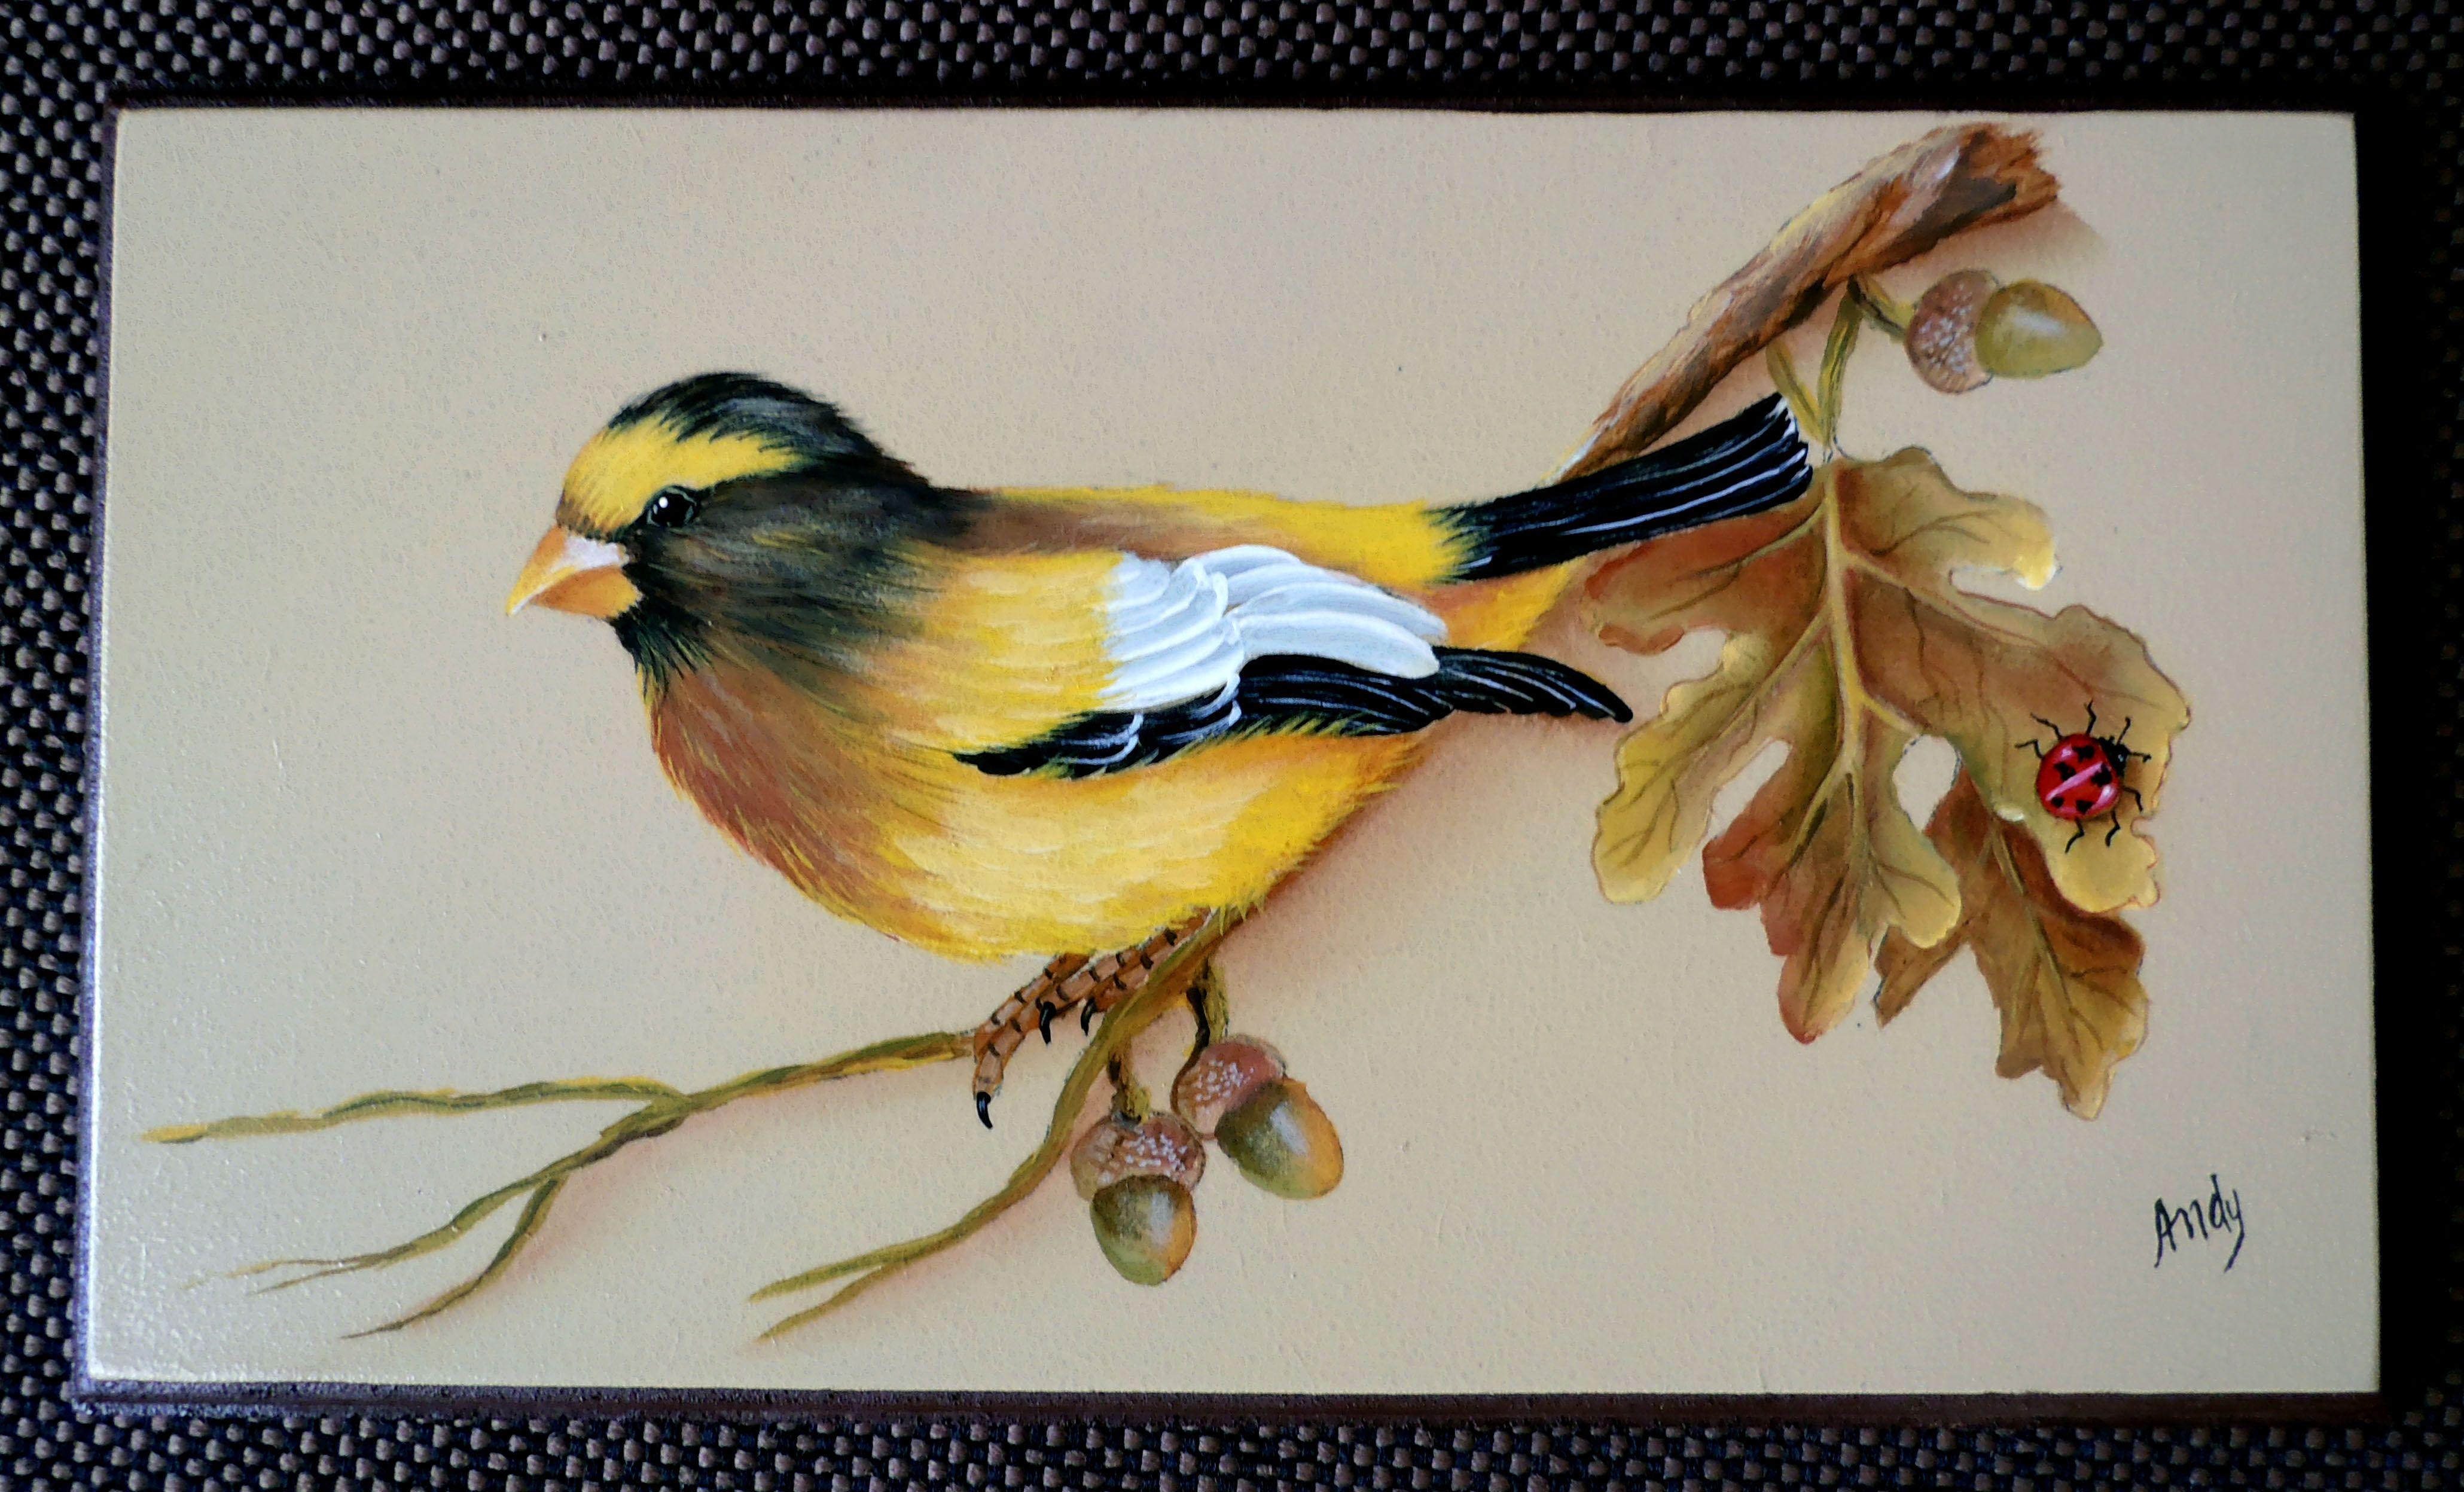 Pássaro americano - pintura de Mary Paiva (Andy) - Livro de Sherry Nelson.